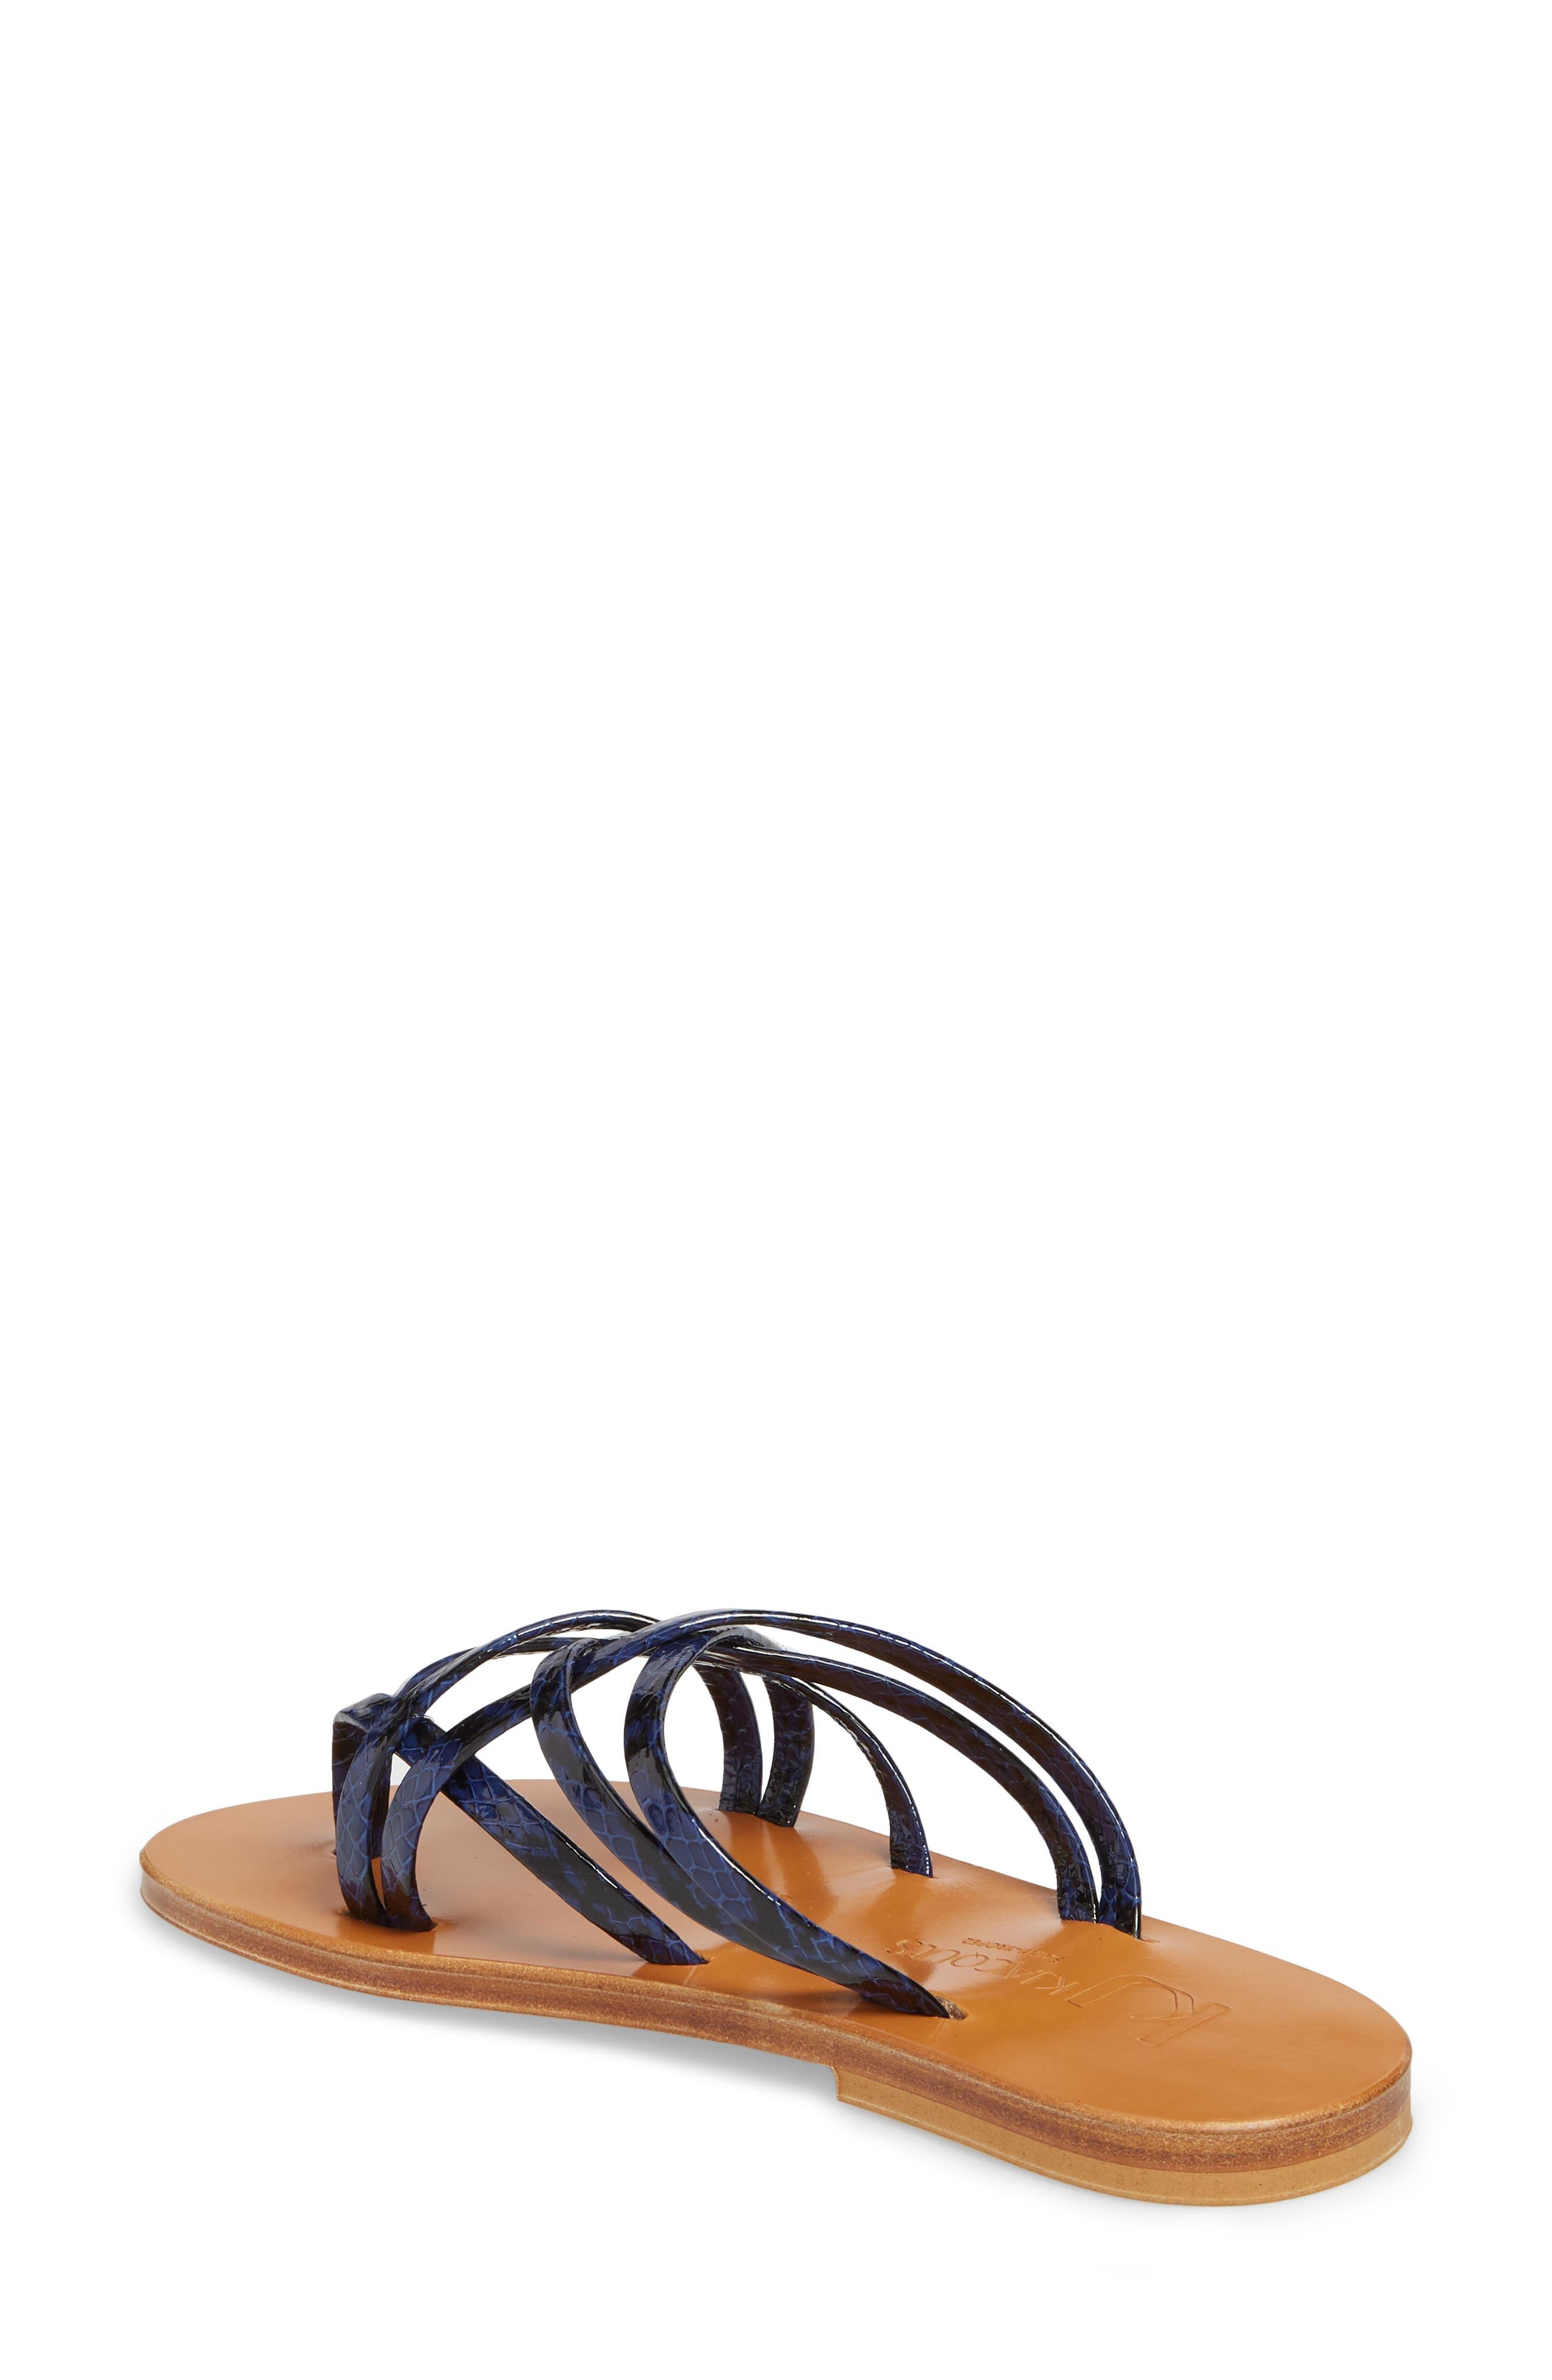 K. Jacques St. Tropez Strappy Thong Sandal,                             Alternate thumbnail 4, color,